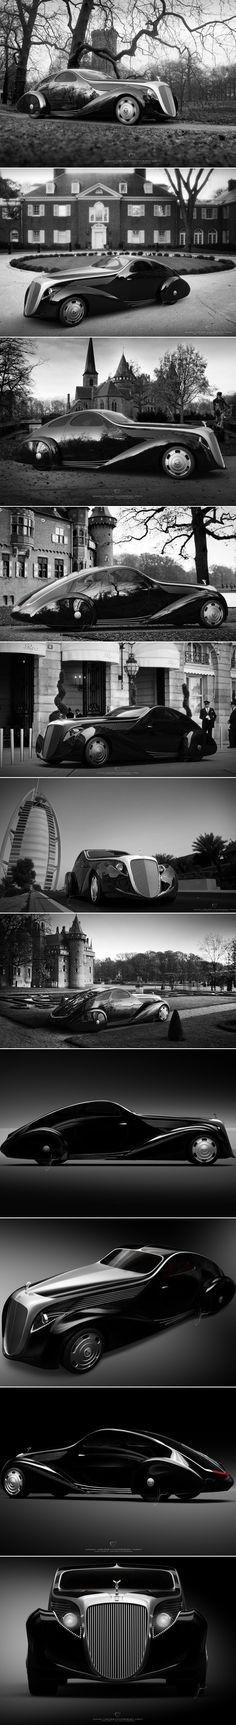 Rolls Royce Jonckheere Aerodynamic-Coupe by Ugur Sahin